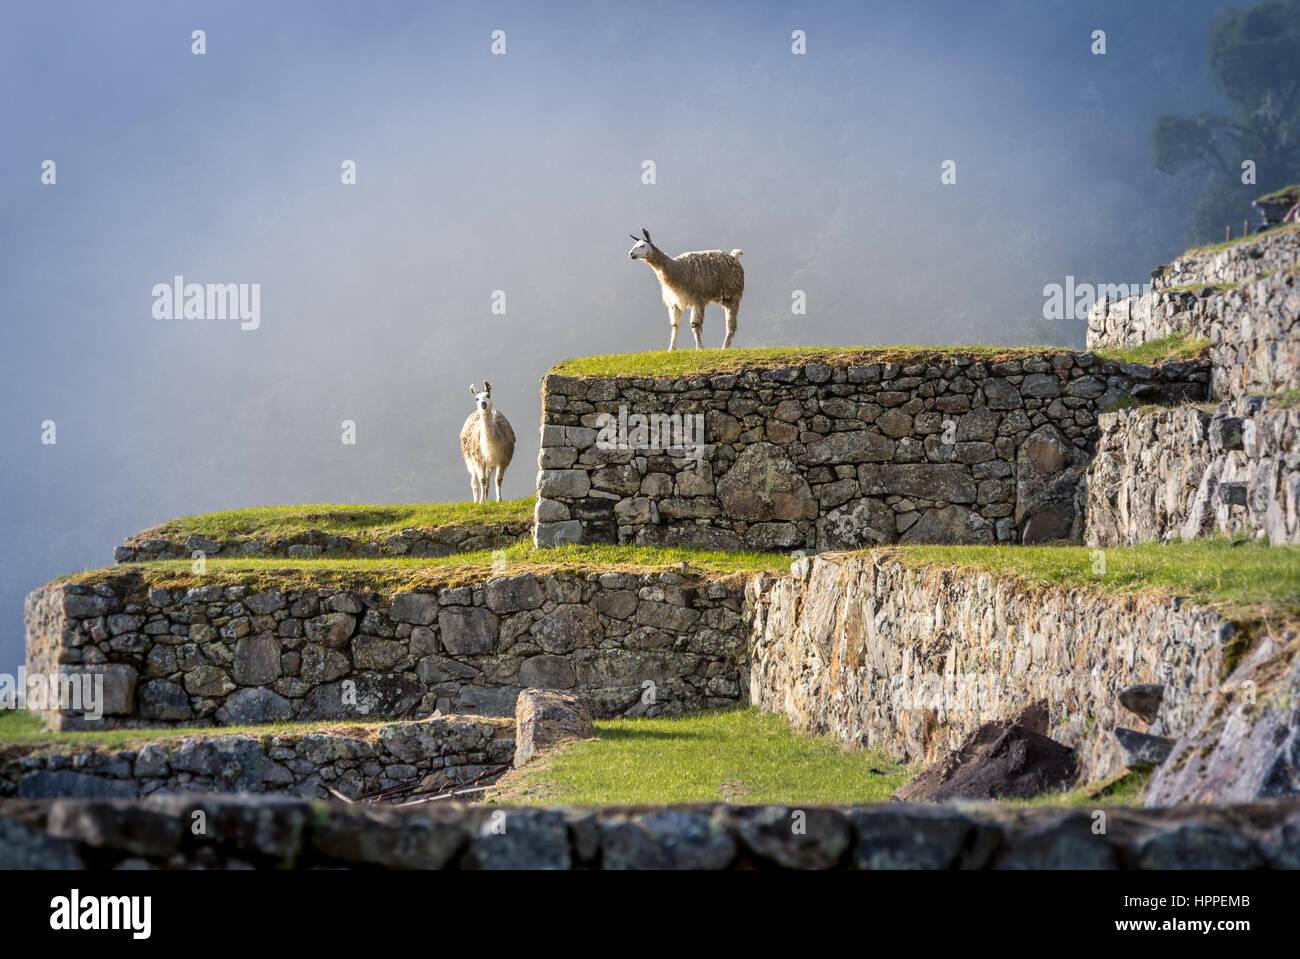 Llamas on Machu Picchu Terraces - Peru - Stock Image